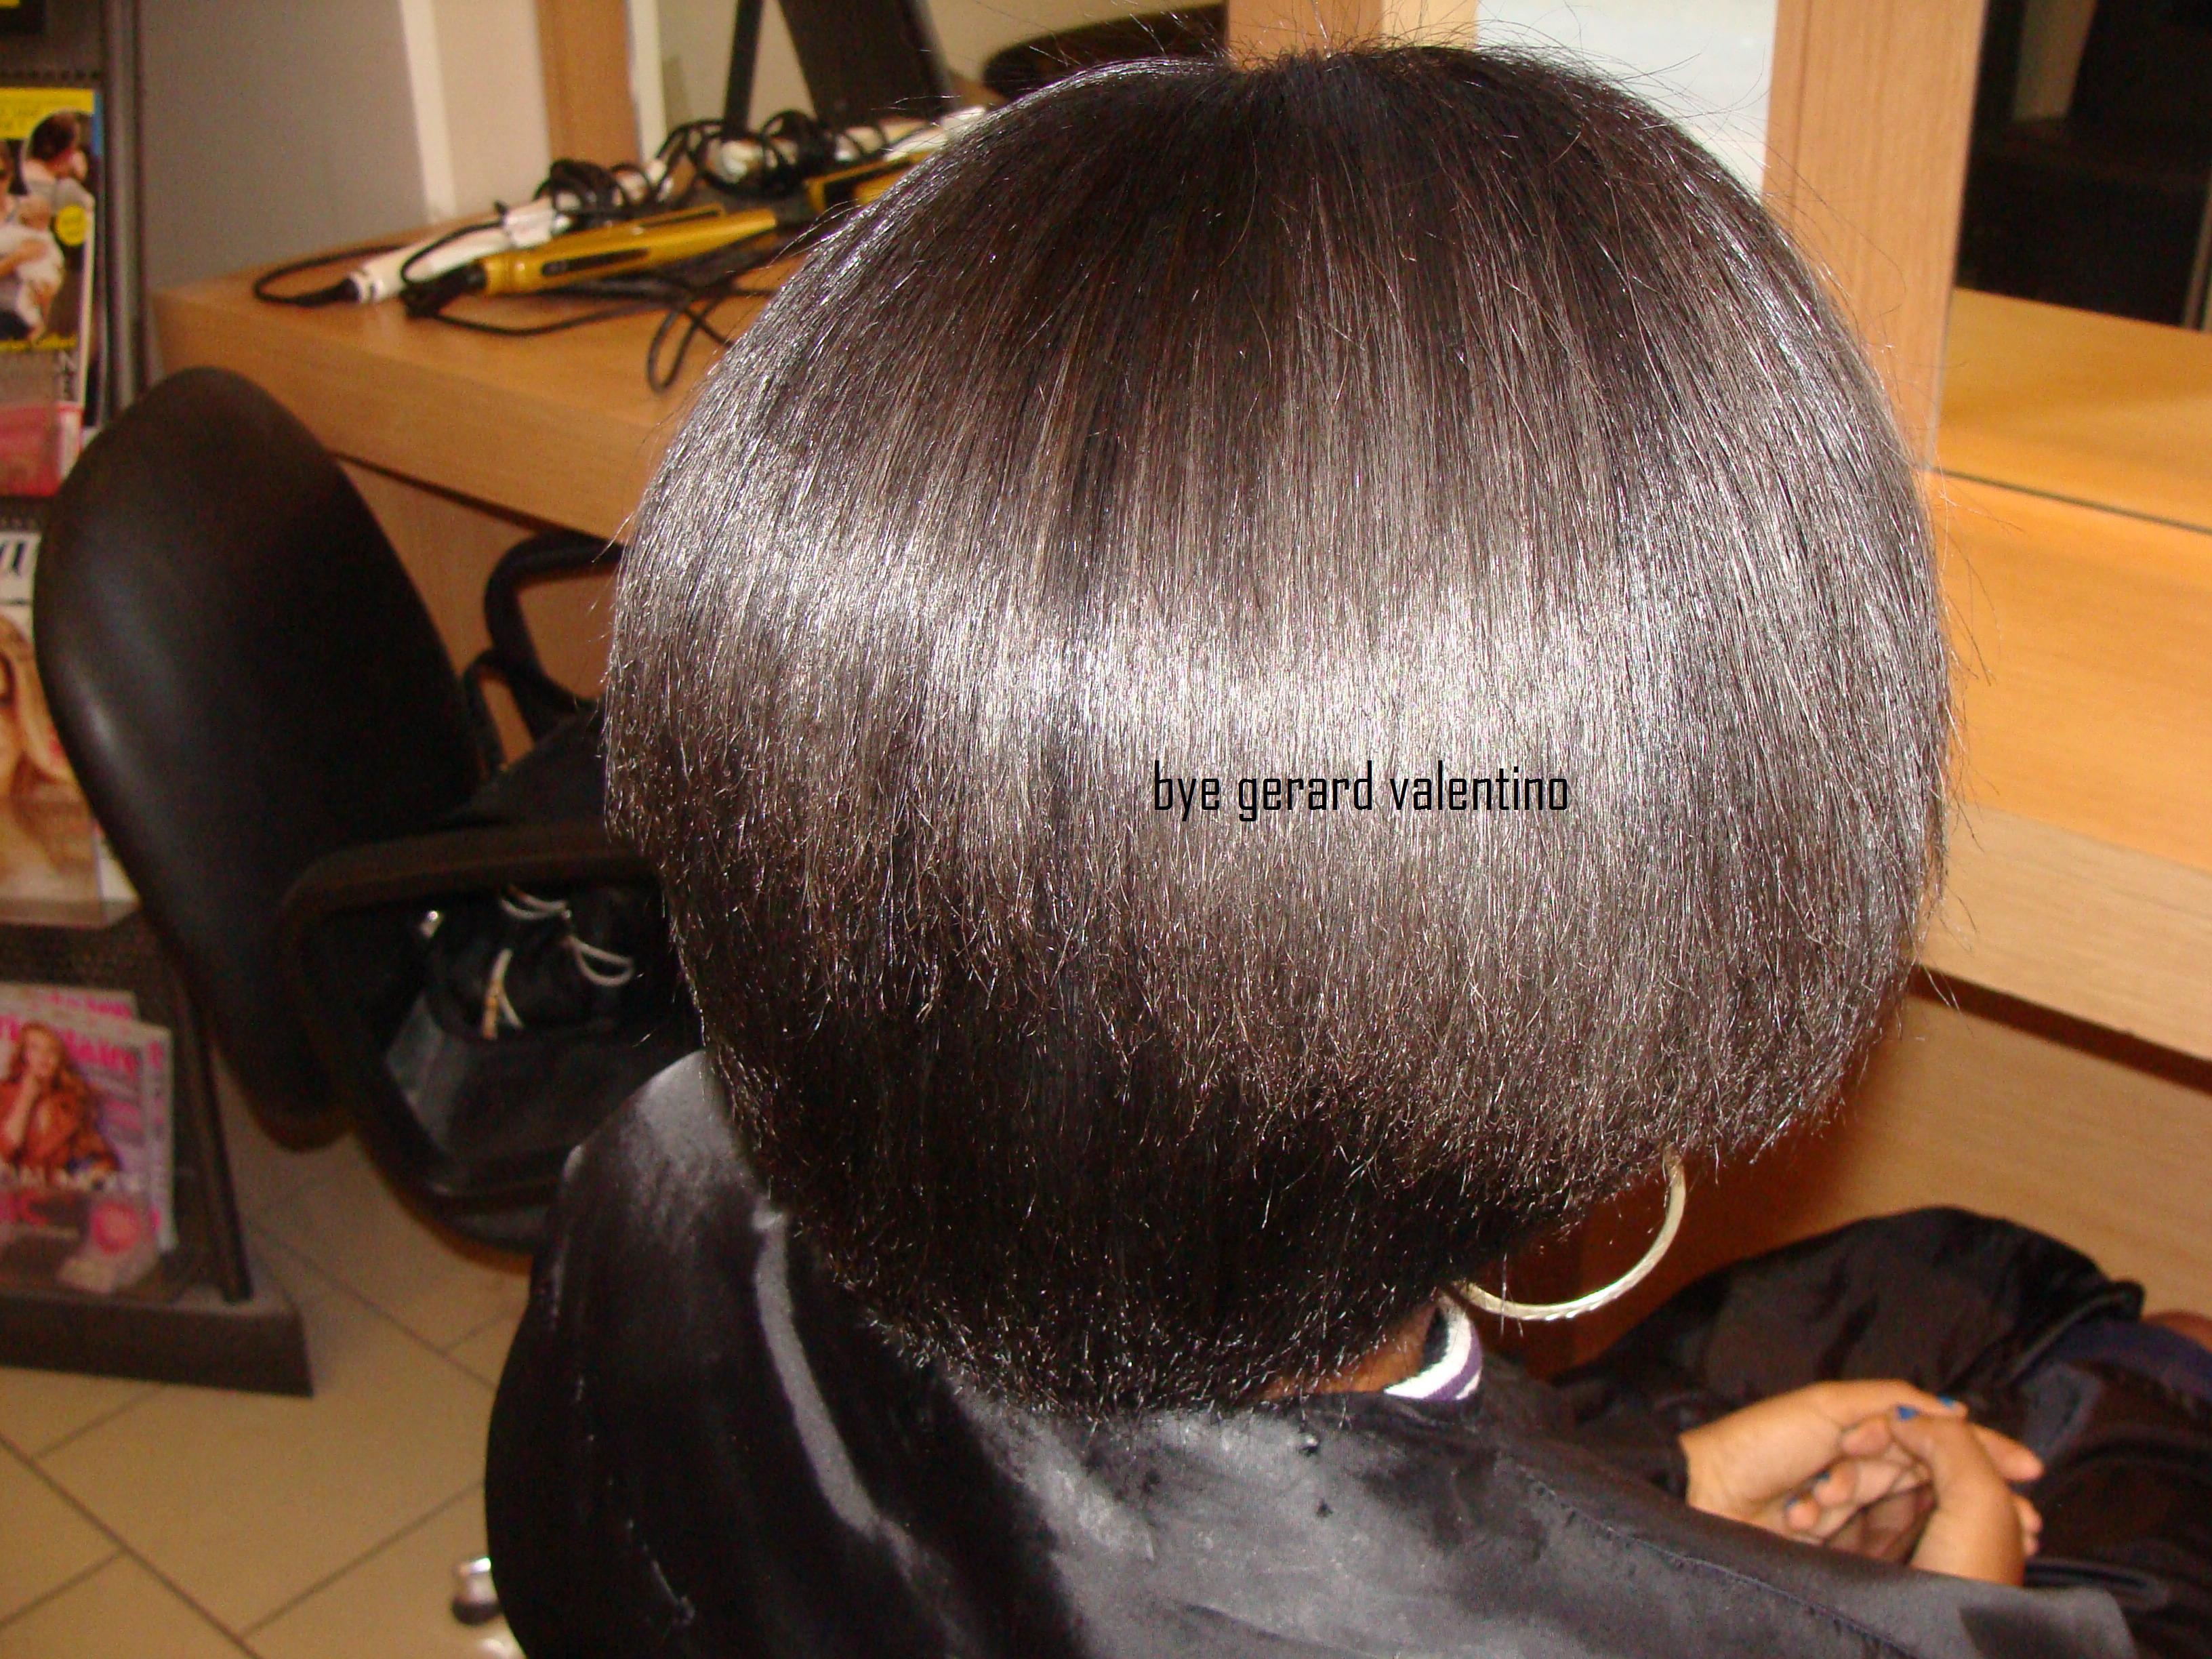 lissage bresilien keratine paris salon de coiffure gerard valentino. Black Bedroom Furniture Sets. Home Design Ideas